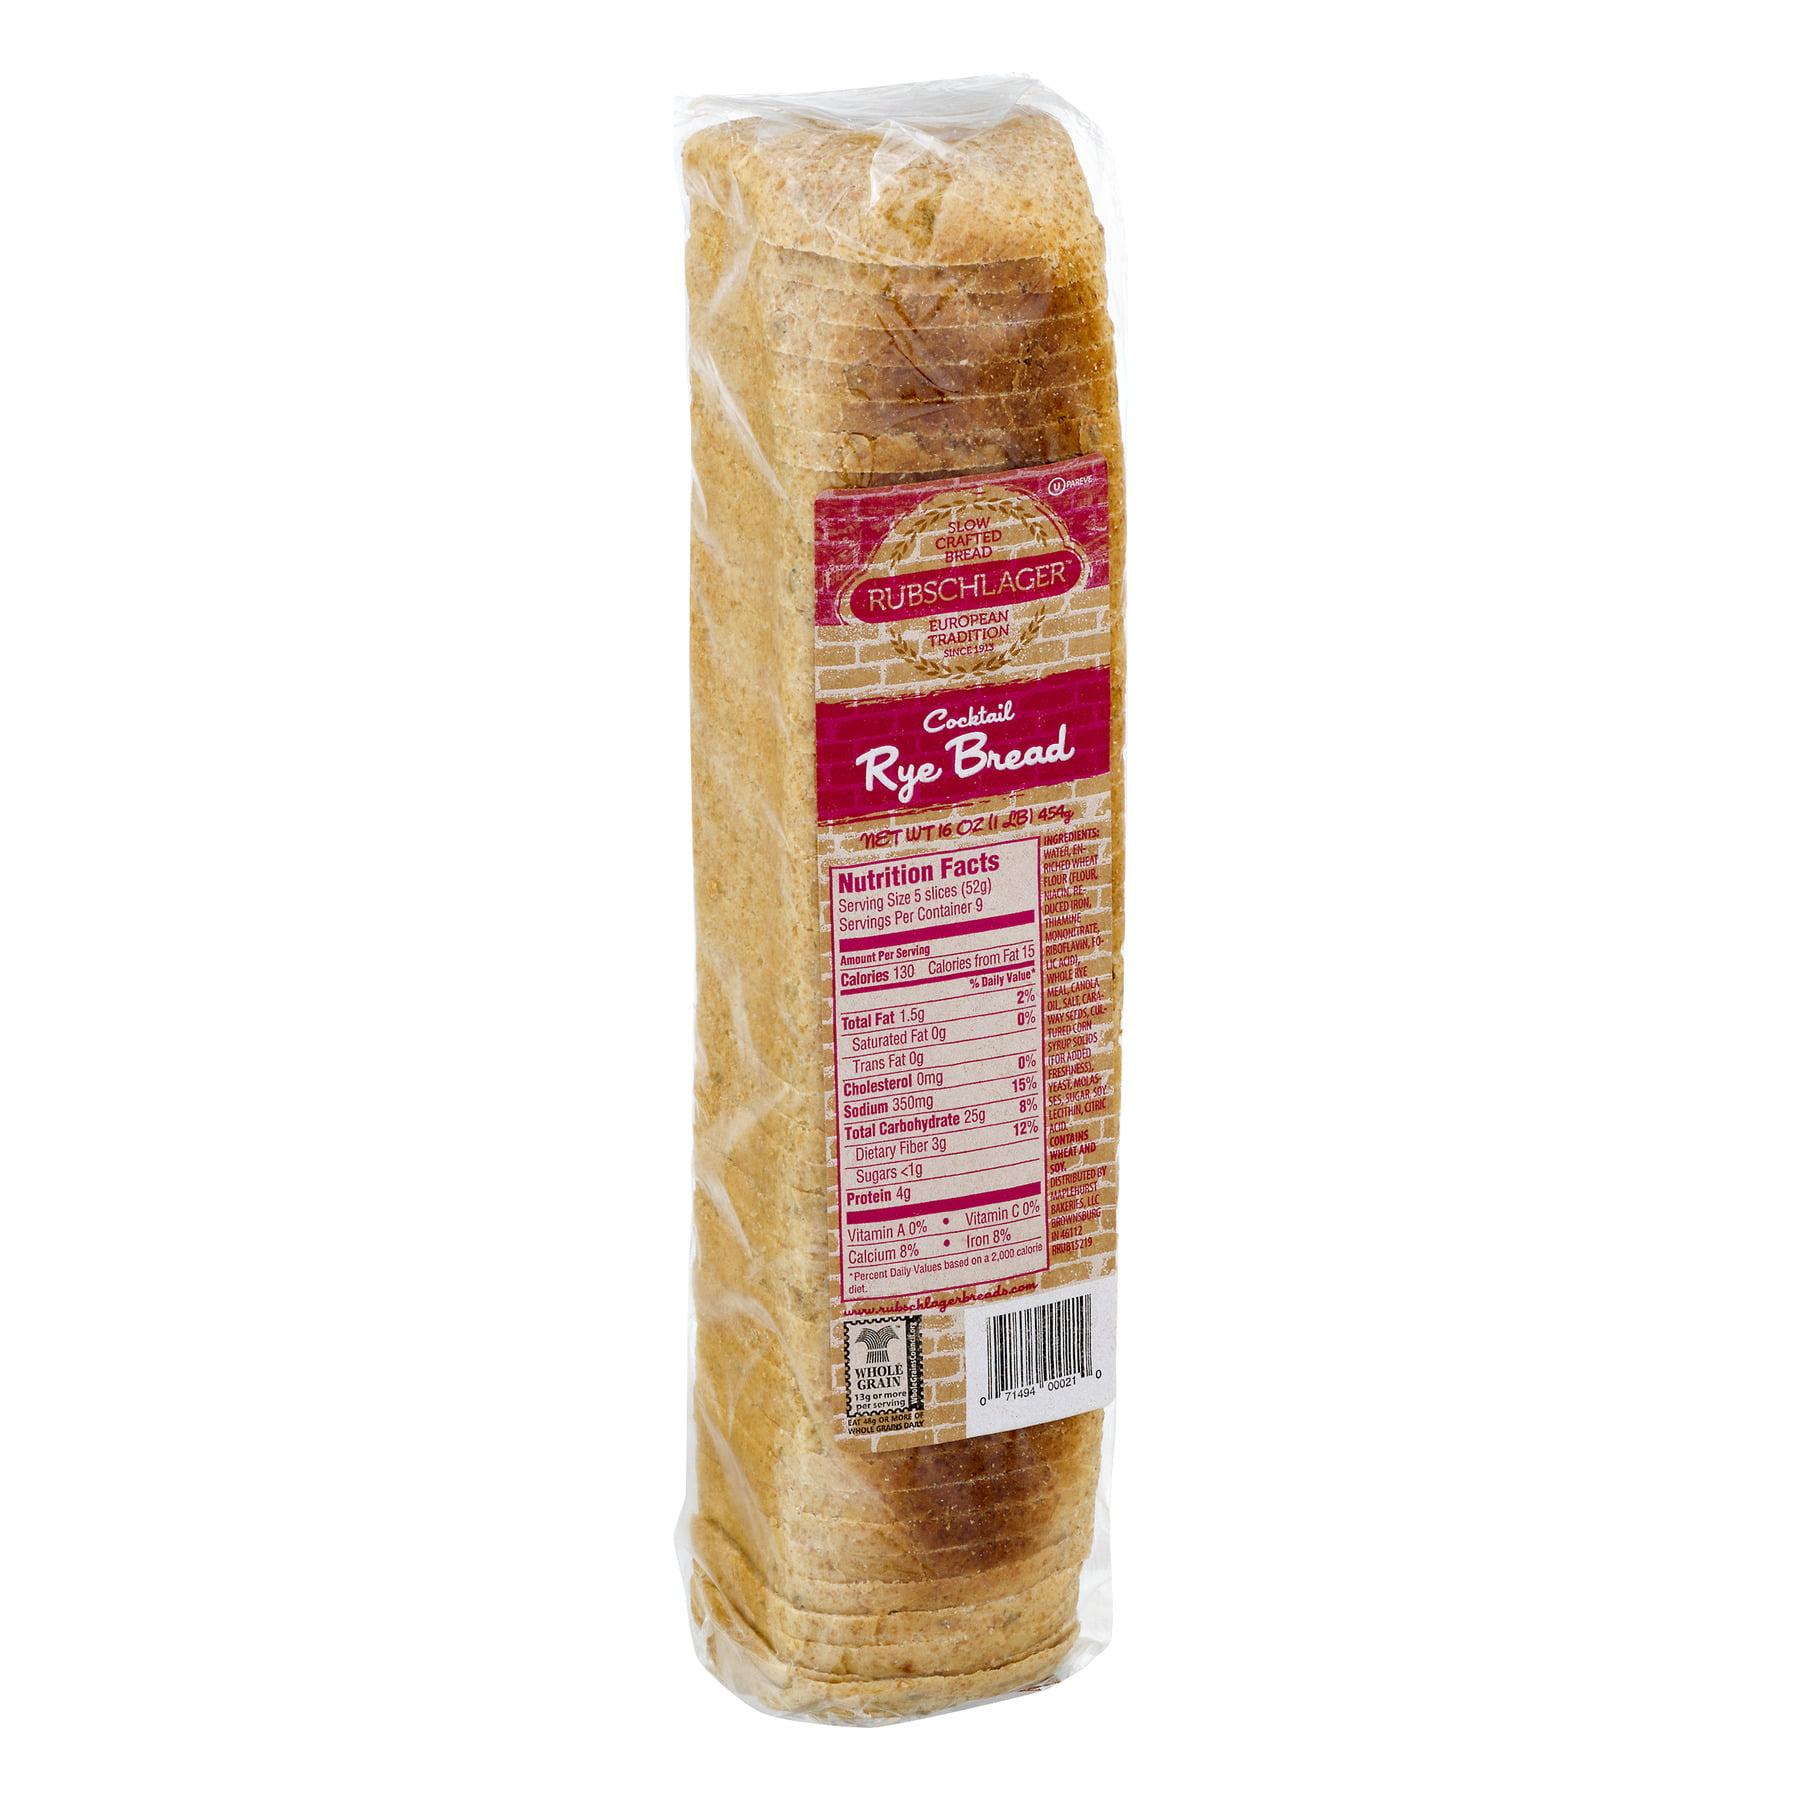 Rubschlager Baking Rubschlager Bread, 1 lb - Walmart com